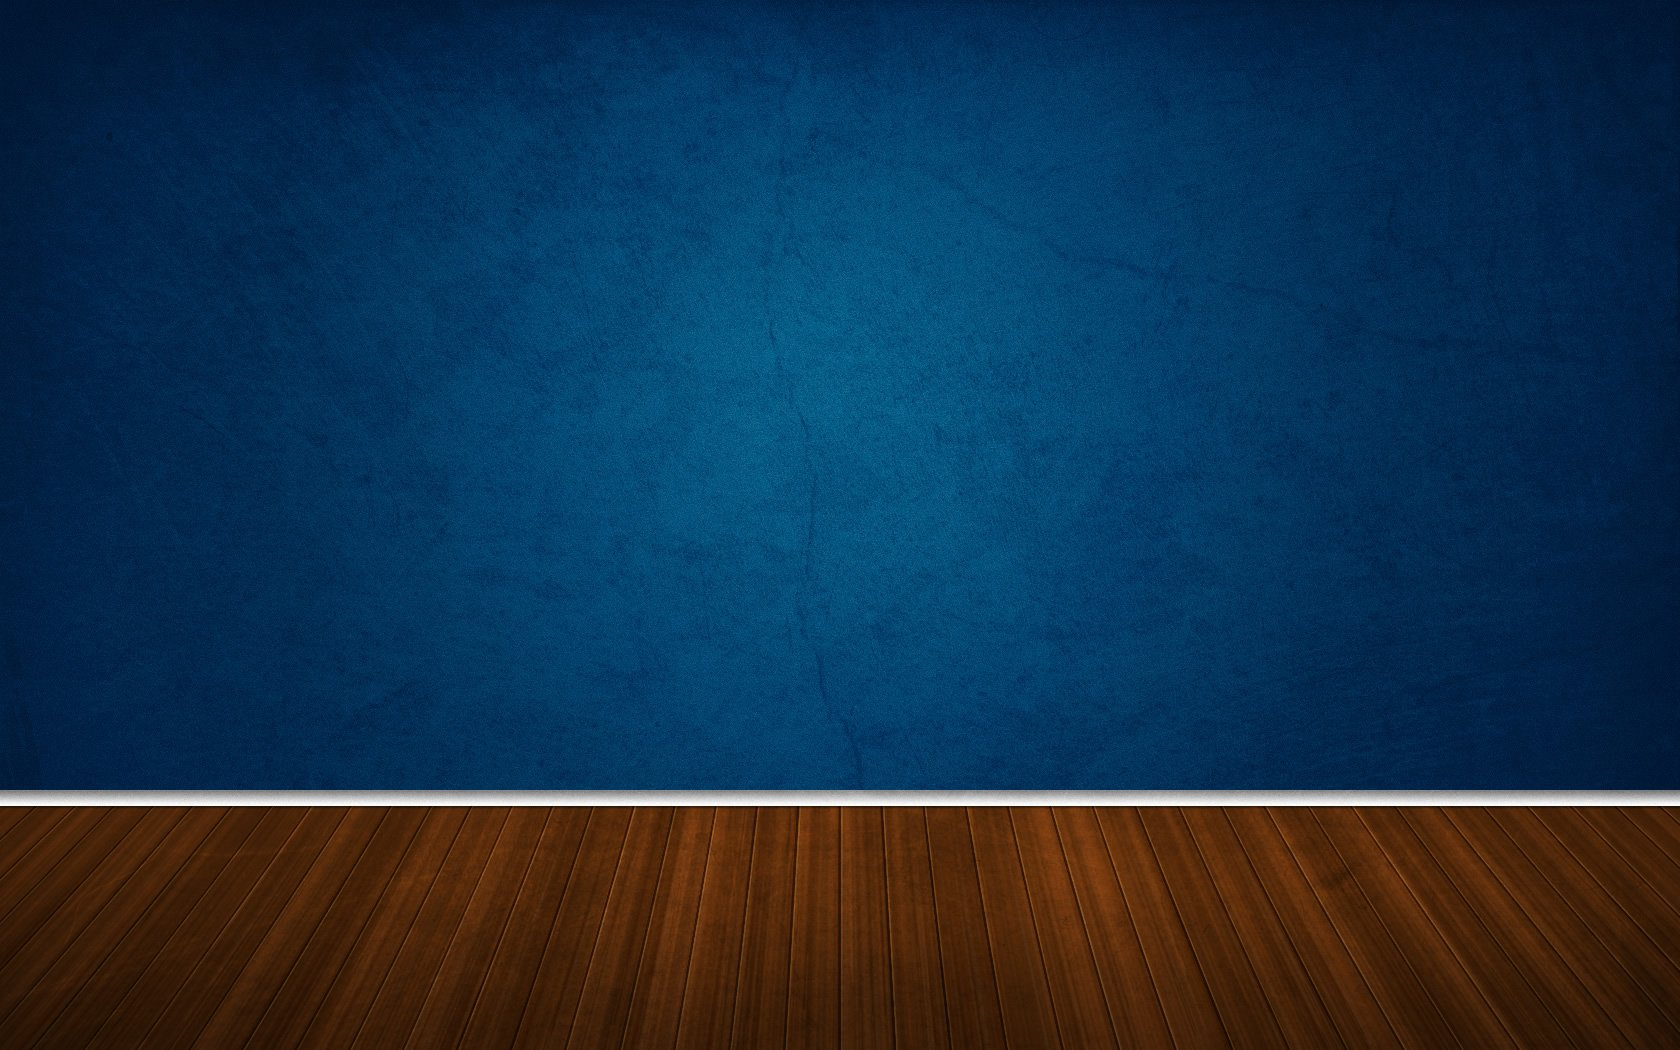 Theme Bin Blog Archive Floorboard and Wall HD Wallpaper 1680x1050